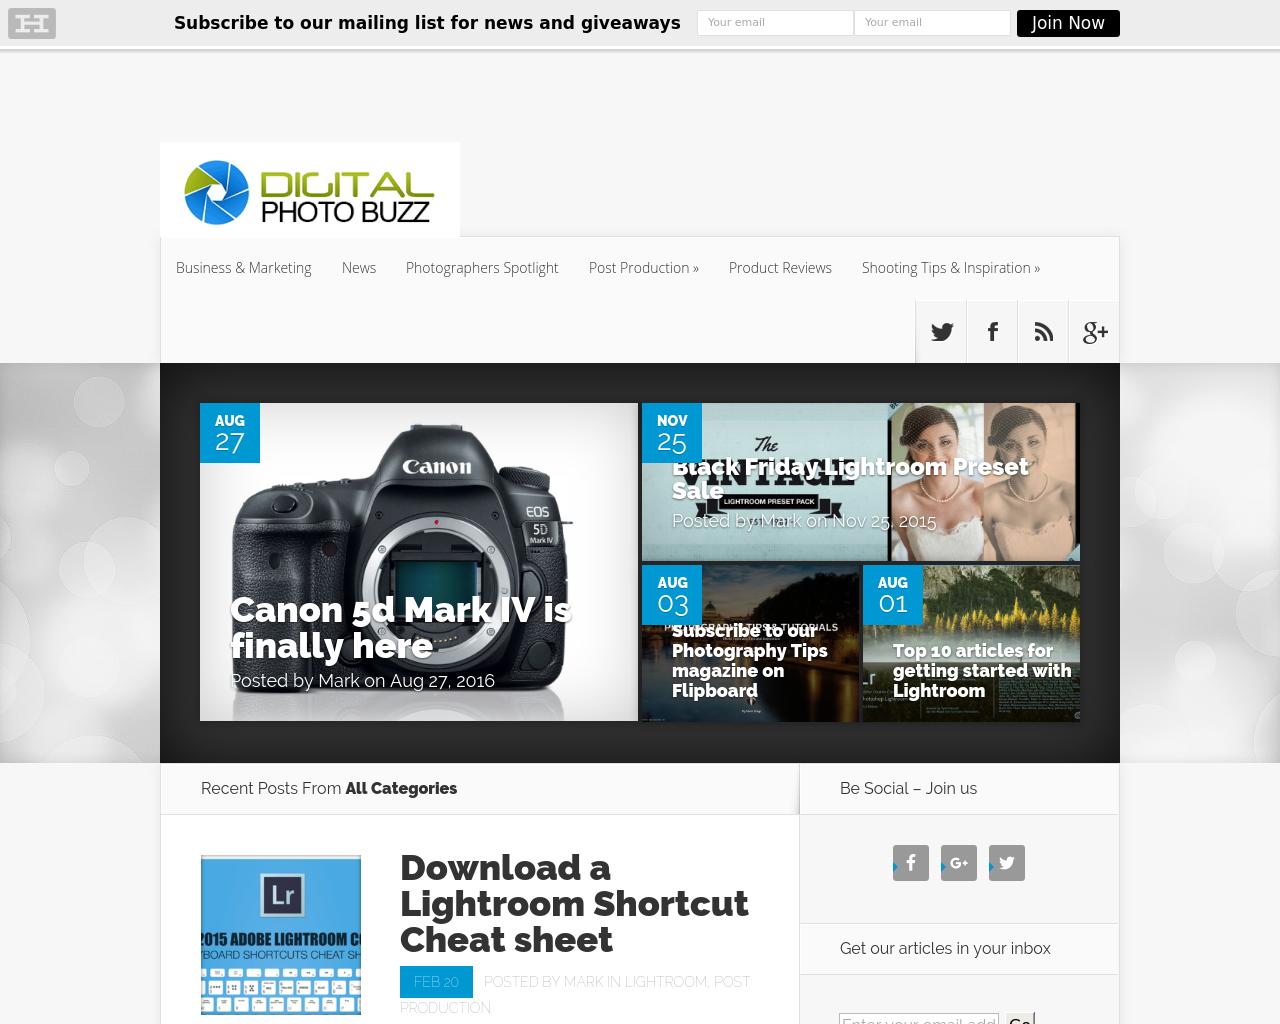 Digital-Photo-Buzz-Advertising-Reviews-Pricing